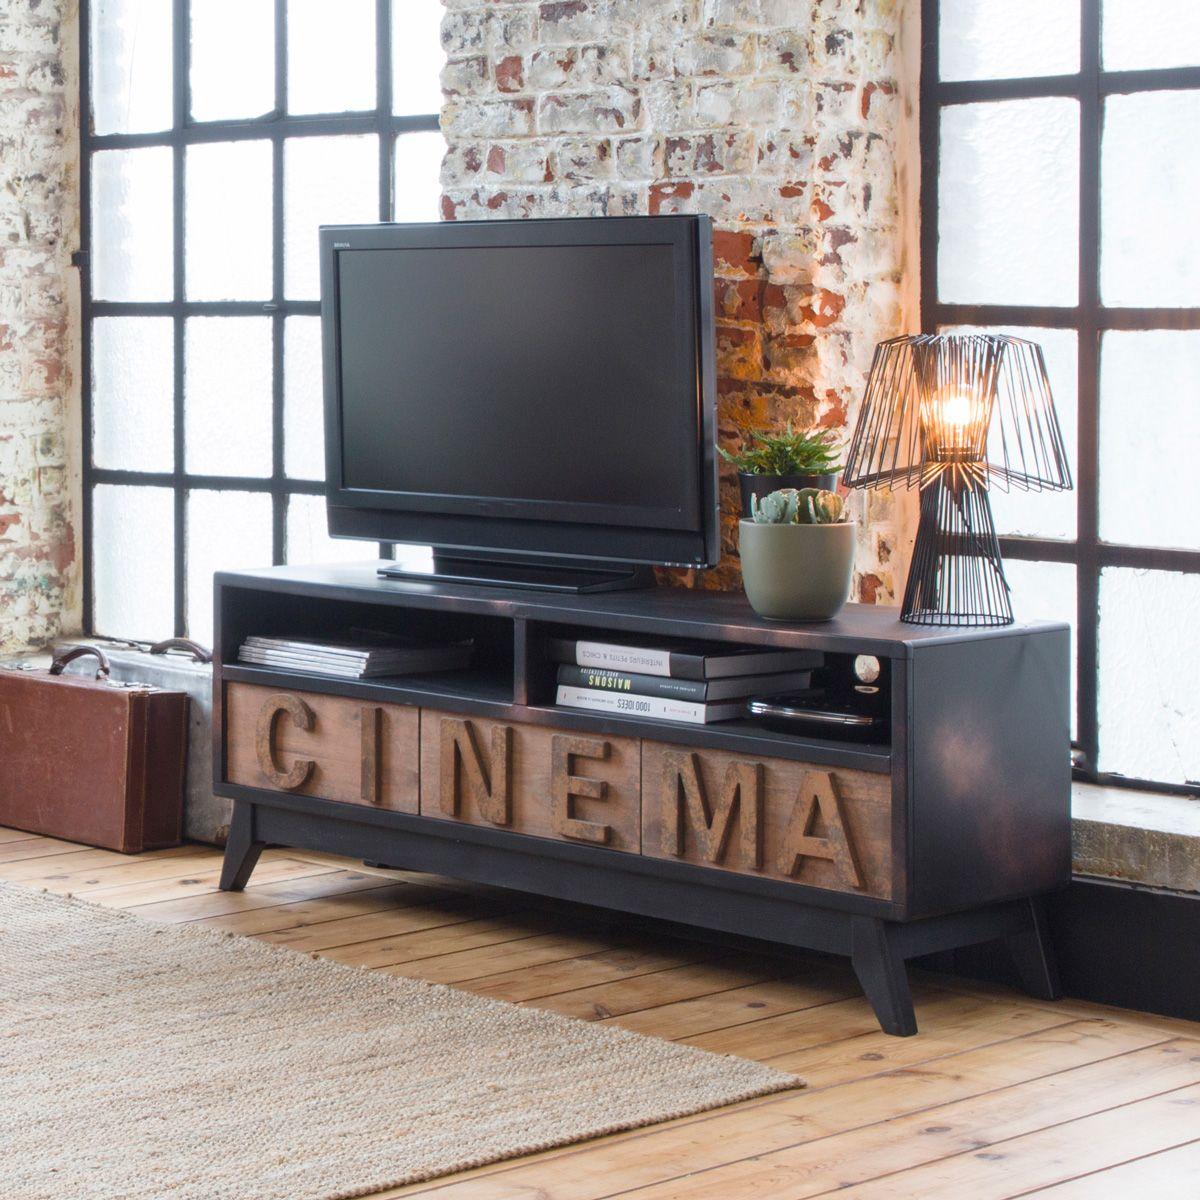 Meuble Tv Mdf Cinema 2 Niches 3 Tiroirs Mobilier De Salon Meuble Tv Meuble